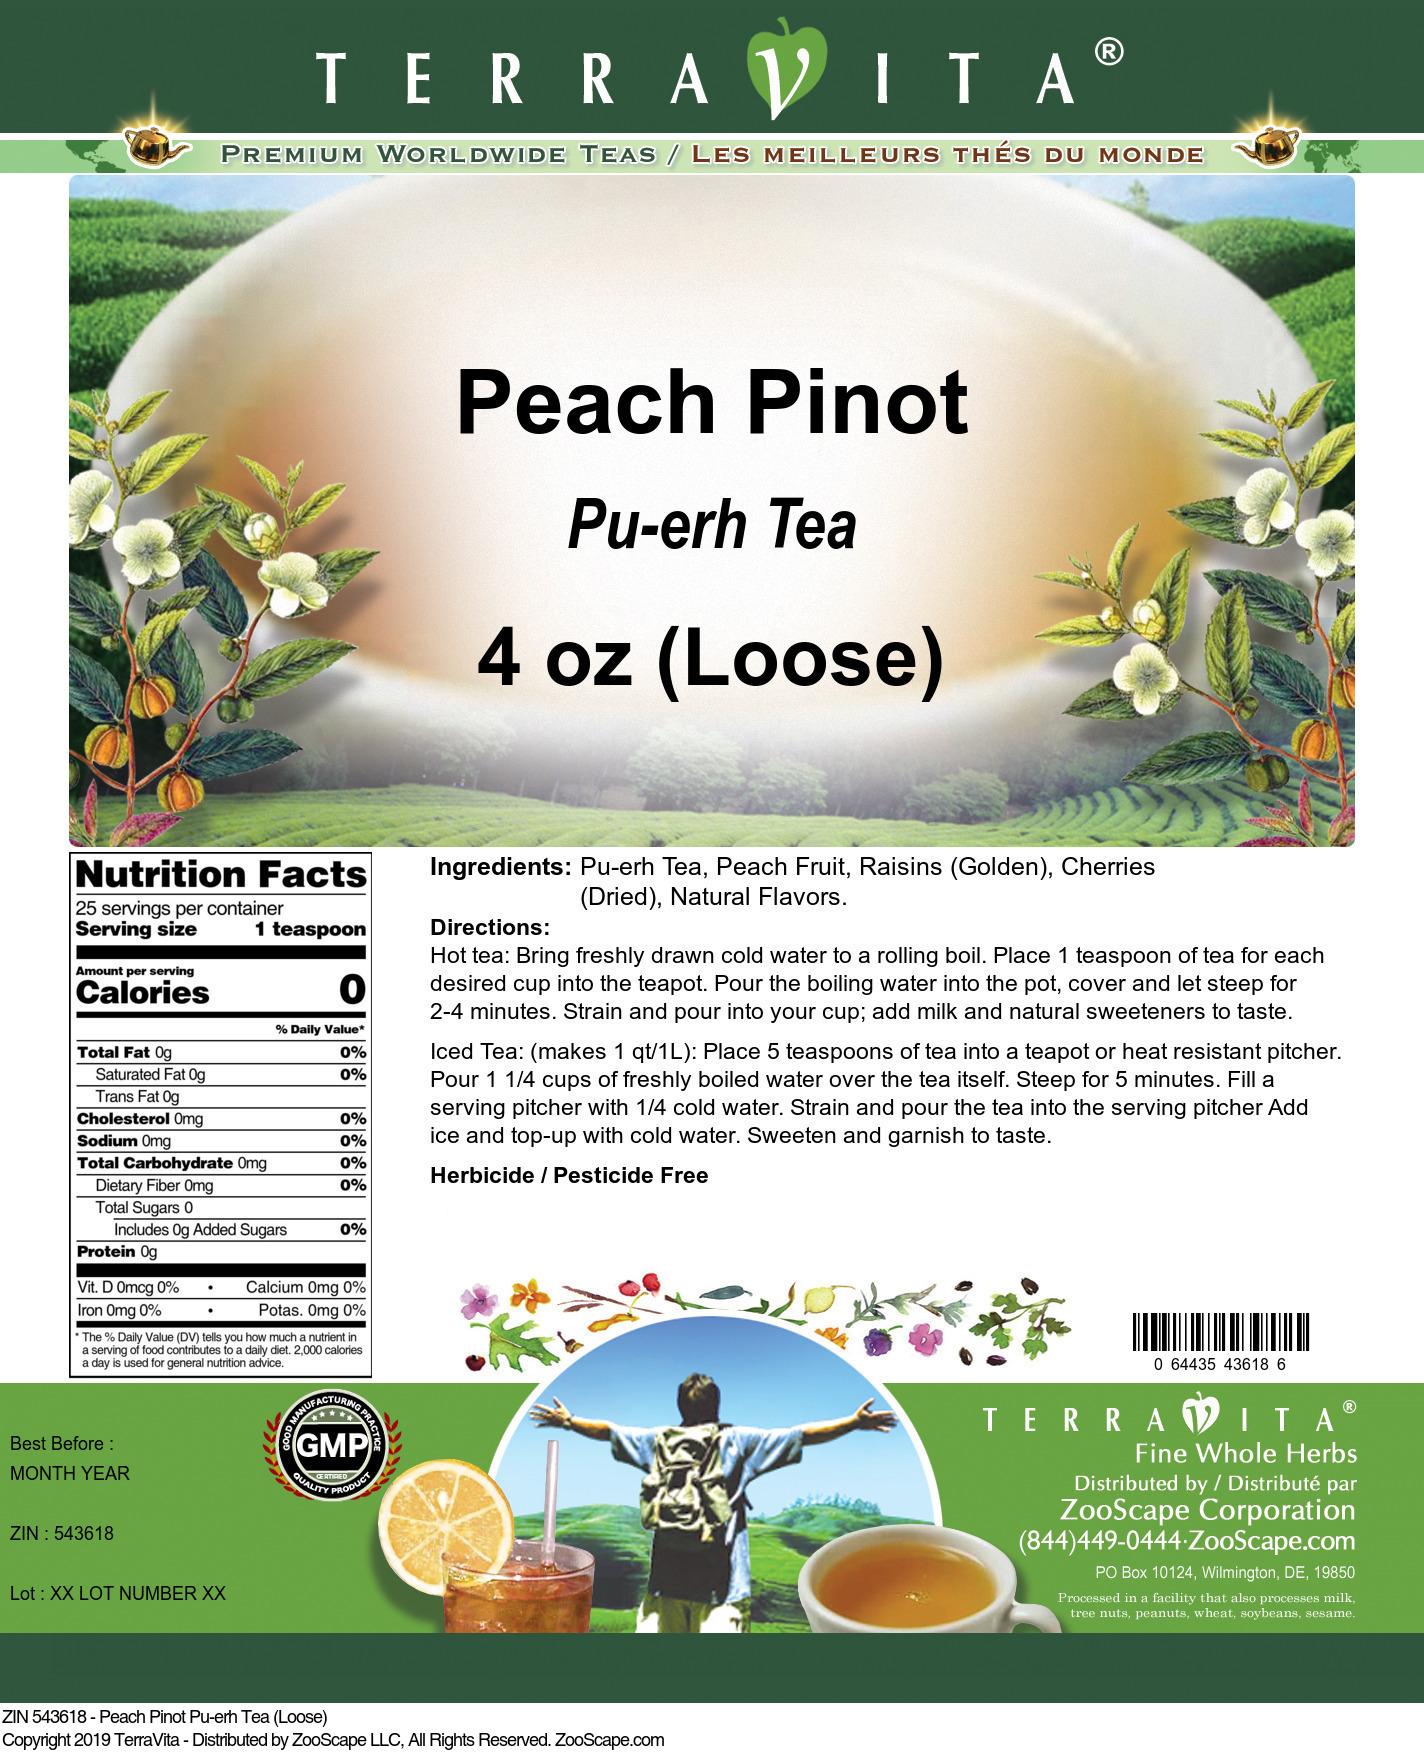 Peach Pinot Pu-erh Tea (Loose)